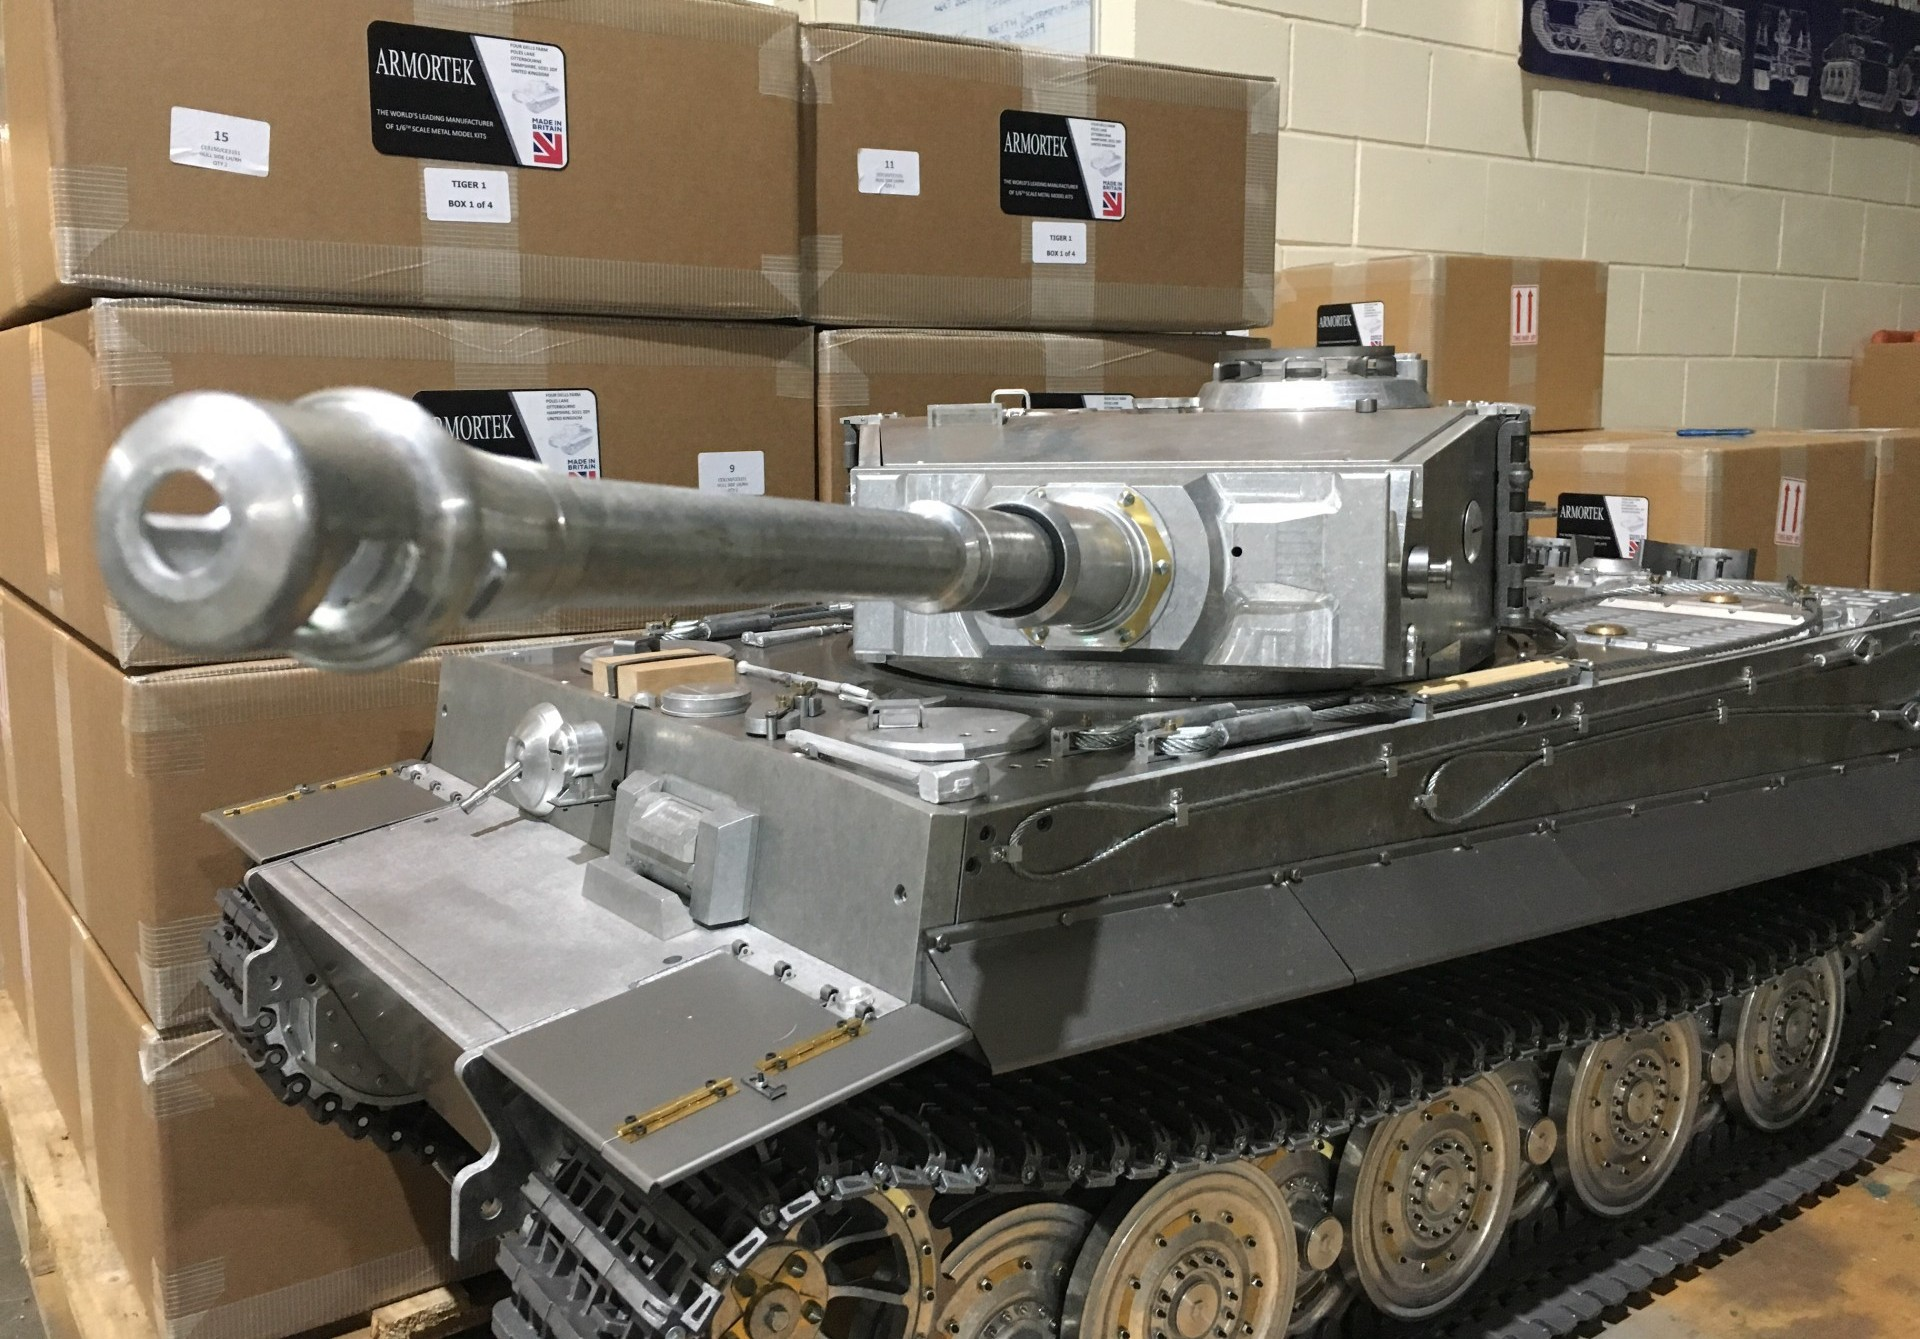 Armortek 1:6 scale Tiger 1